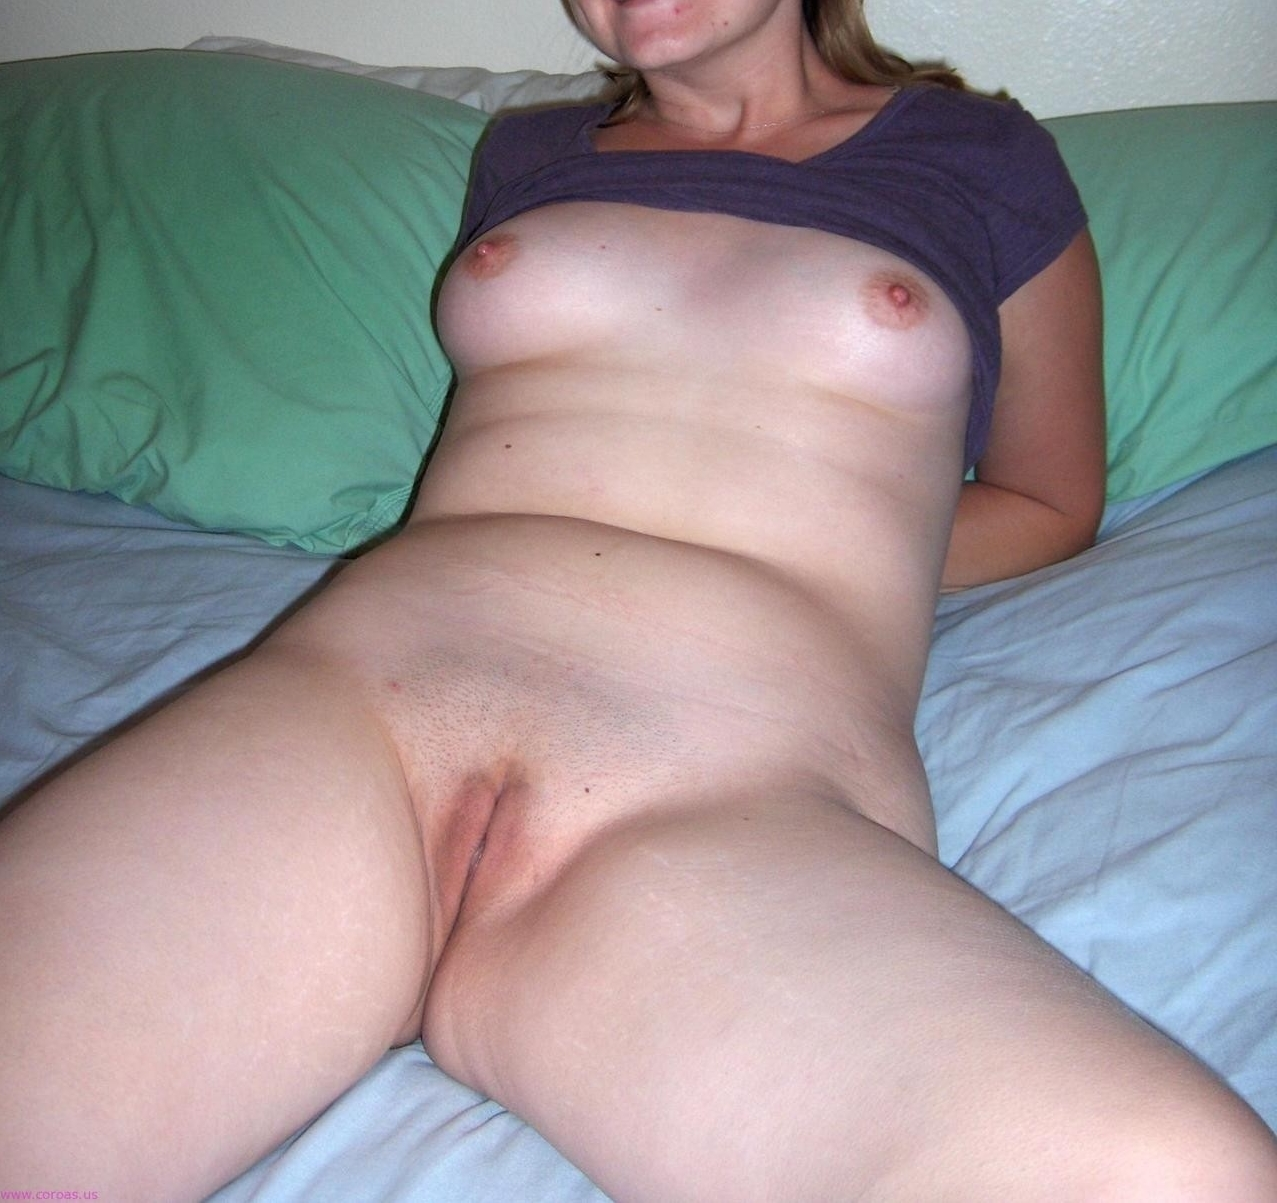 beau sexe sexe gros cul